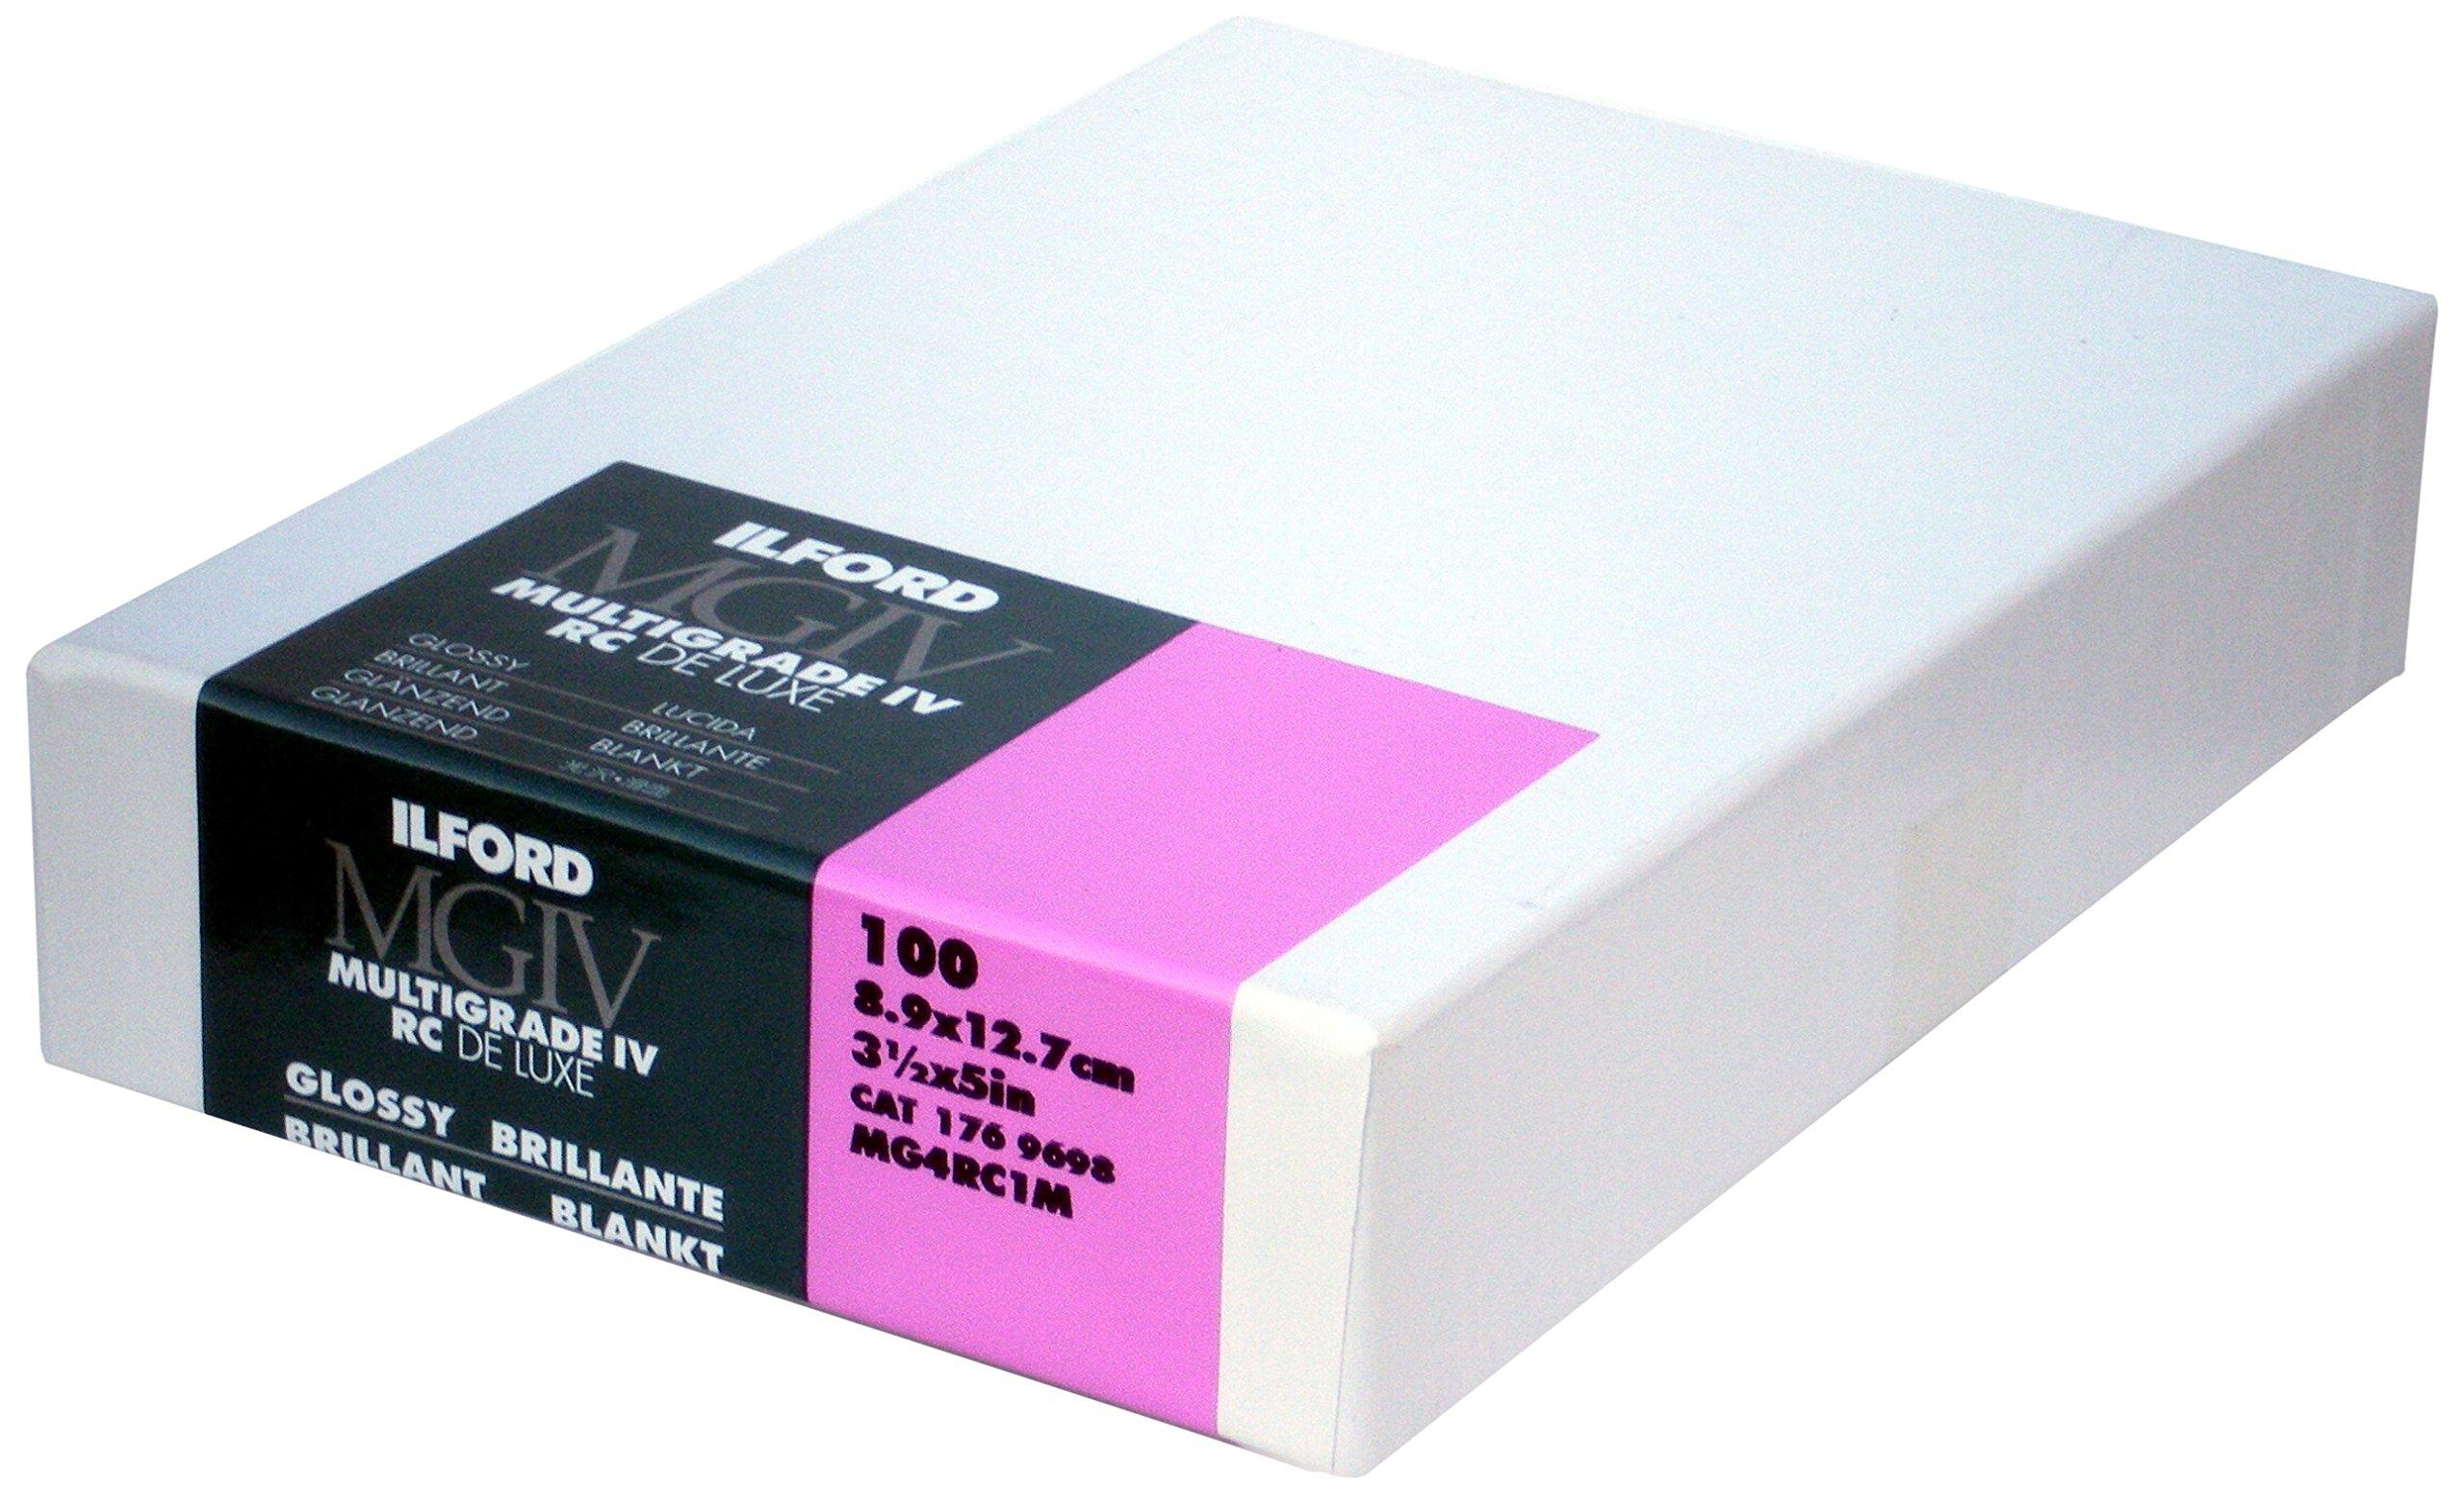 Ilford MGRC Glossy - 3.5inx5in 100 Sheets..